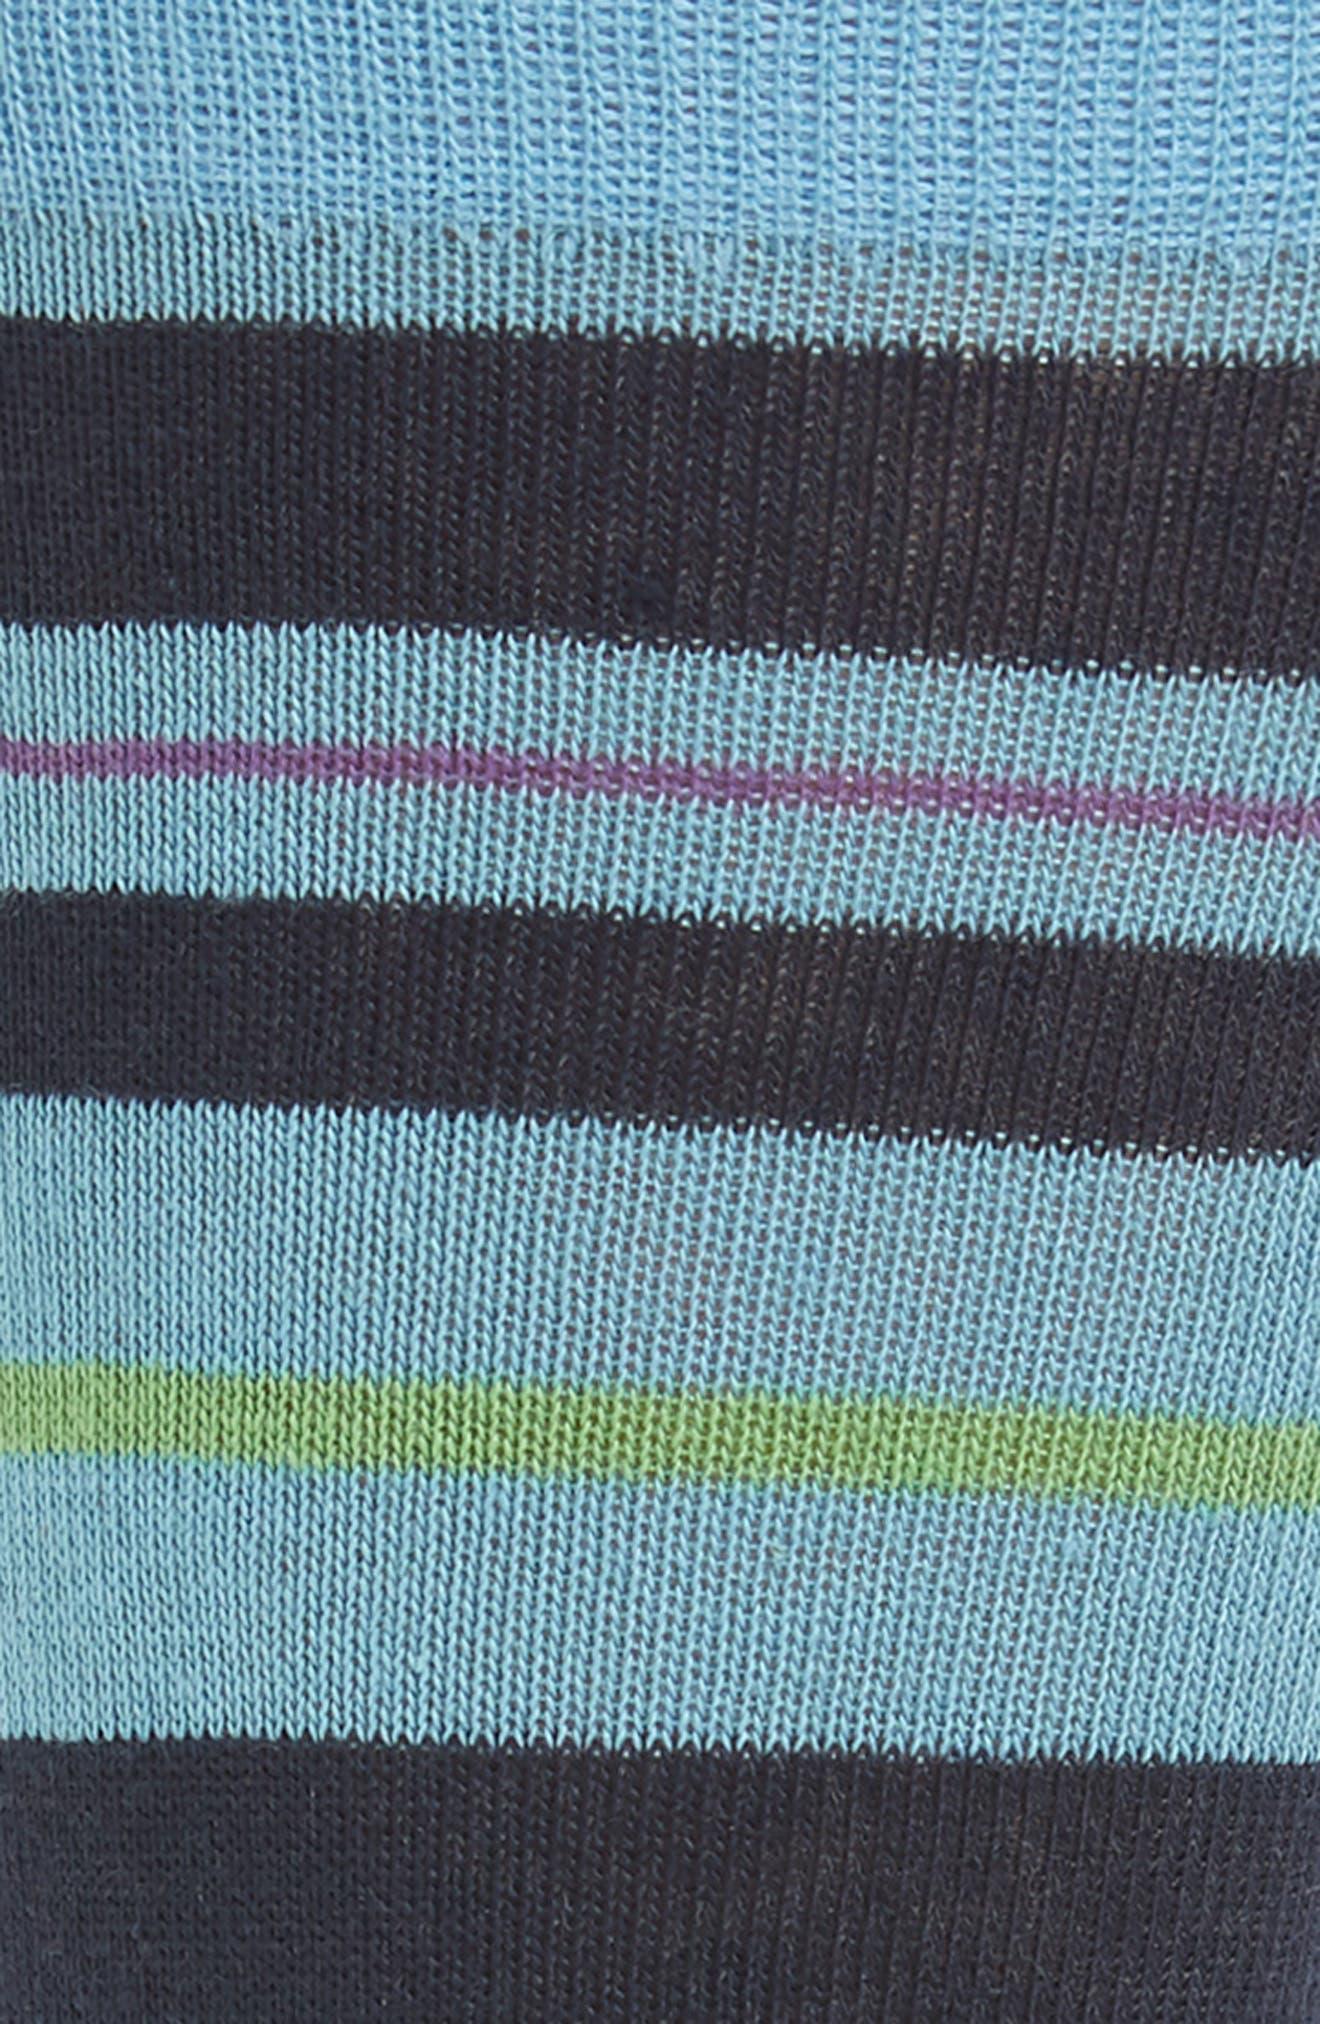 Mixed Stripe Socks,                             Alternate thumbnail 2, color,                             450